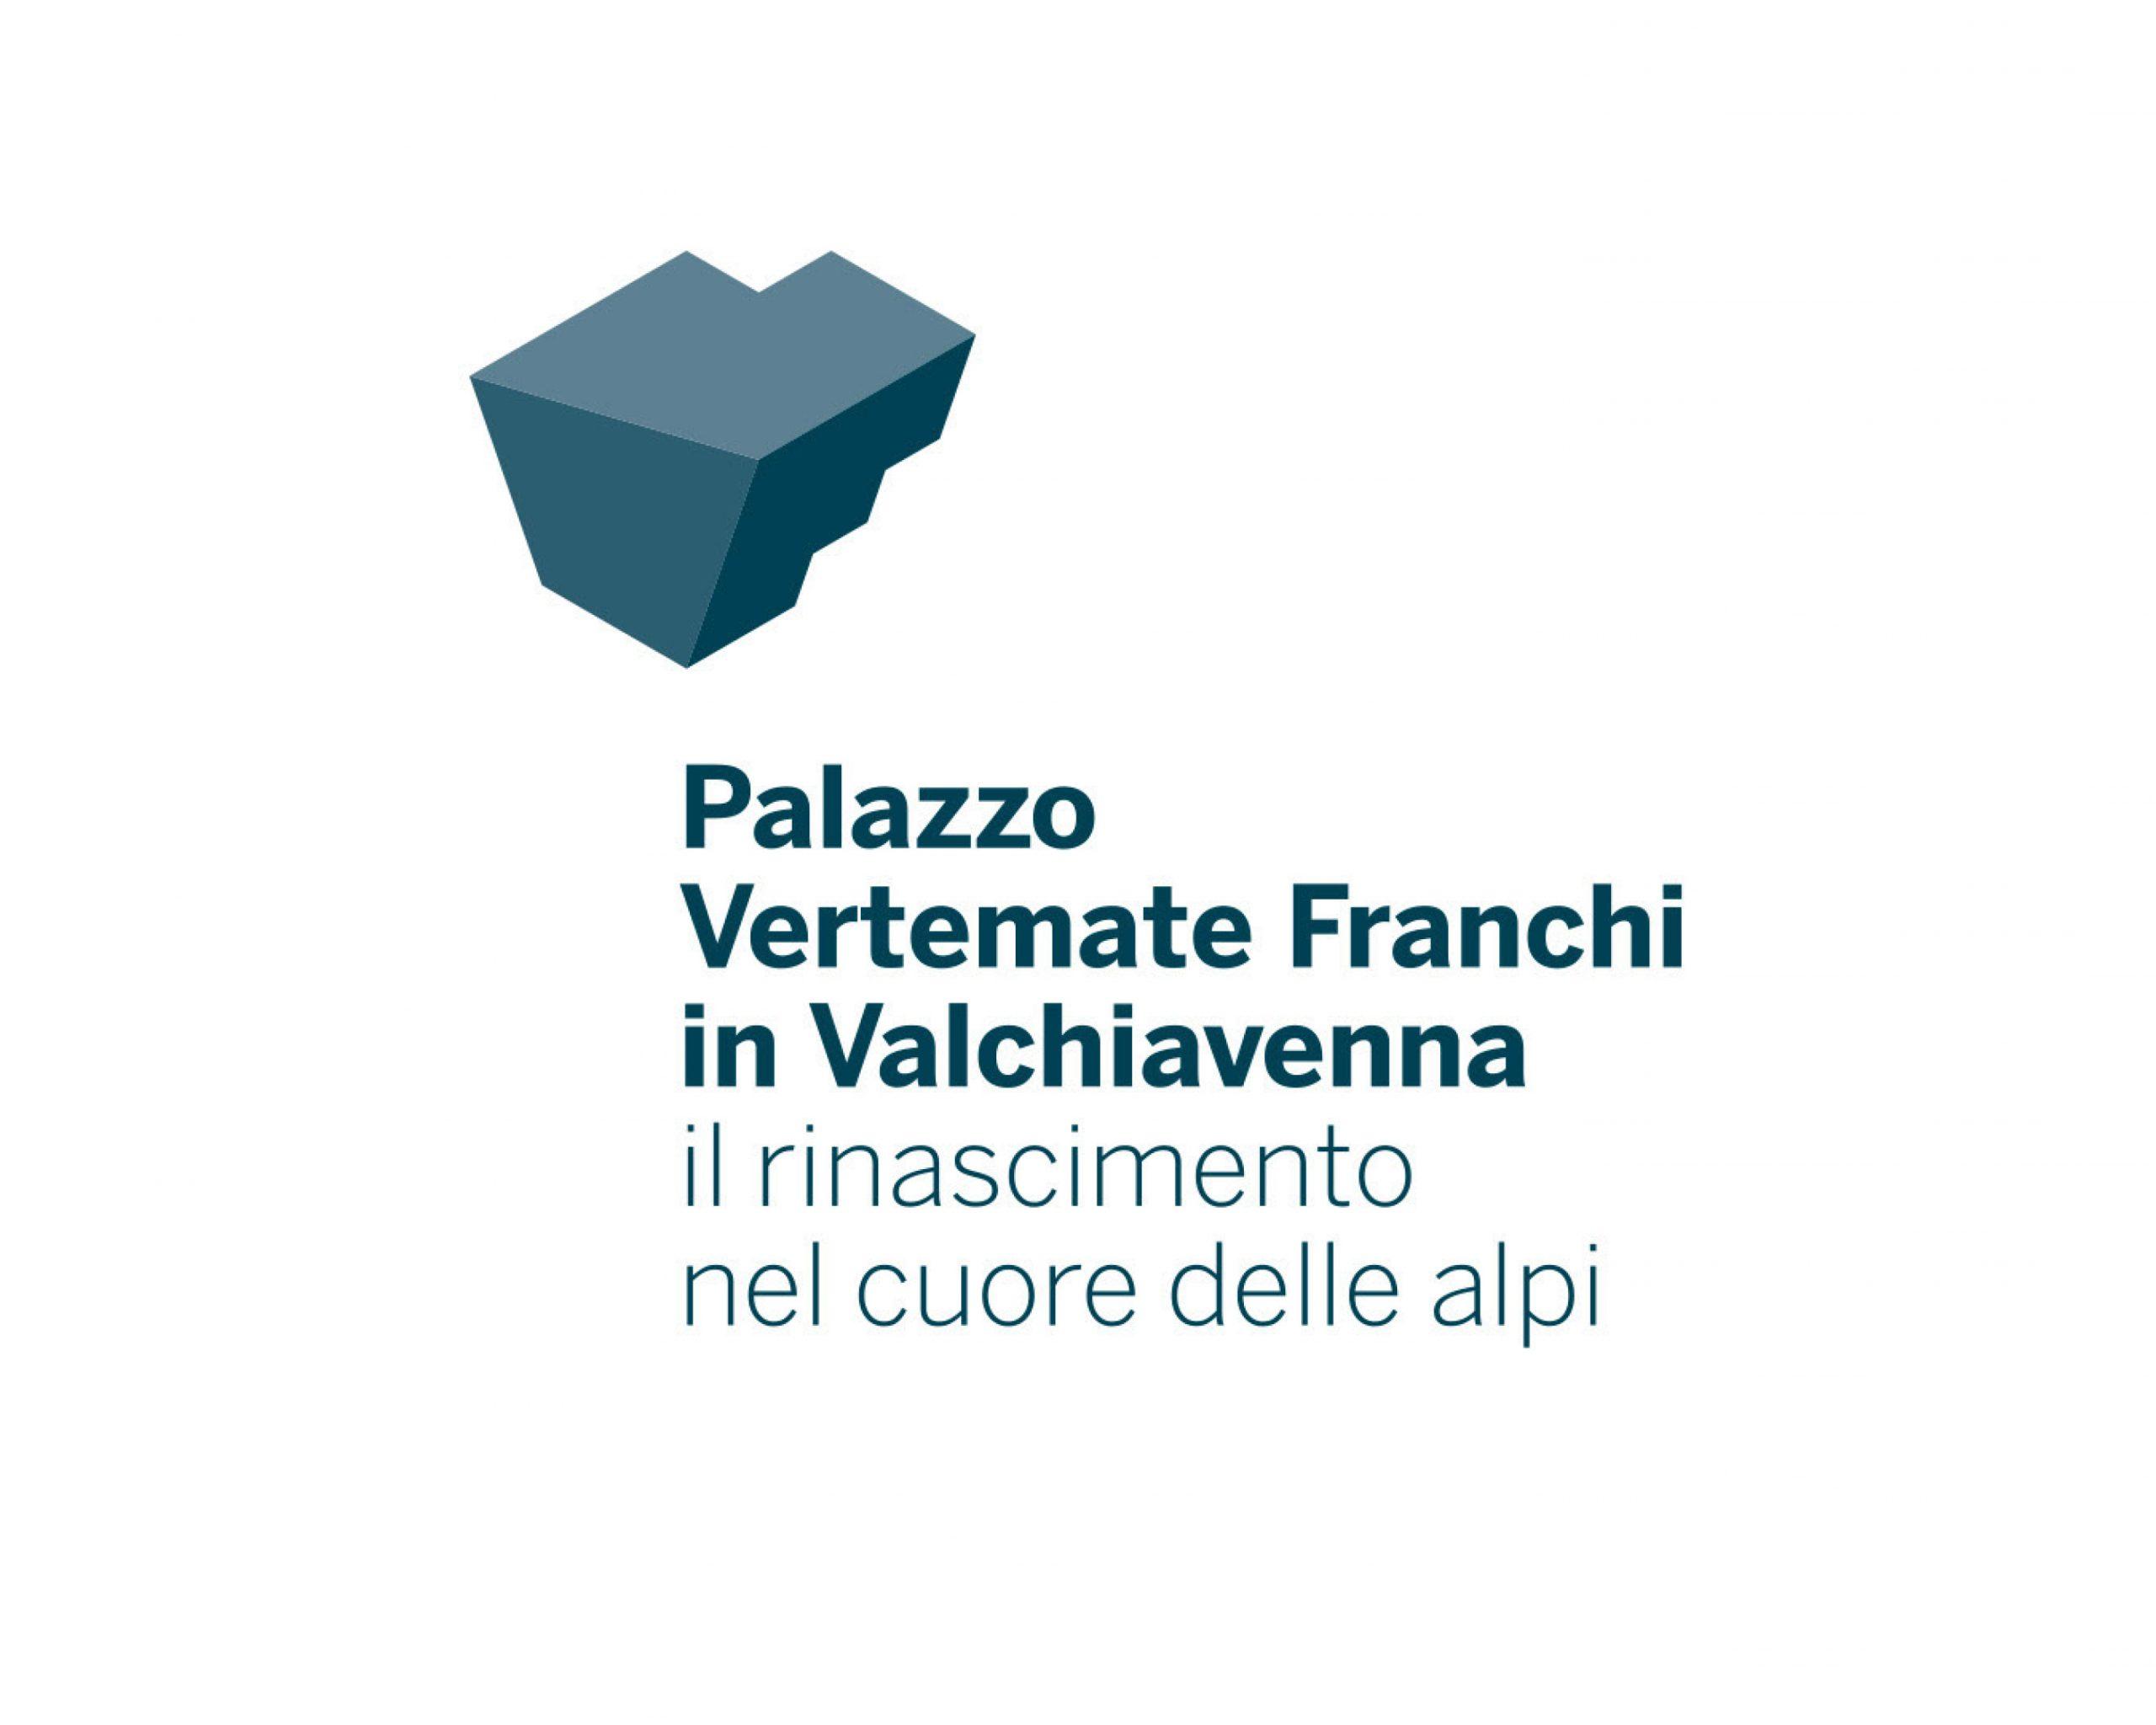 goomlab-palazzo-vertemate-franchi-4